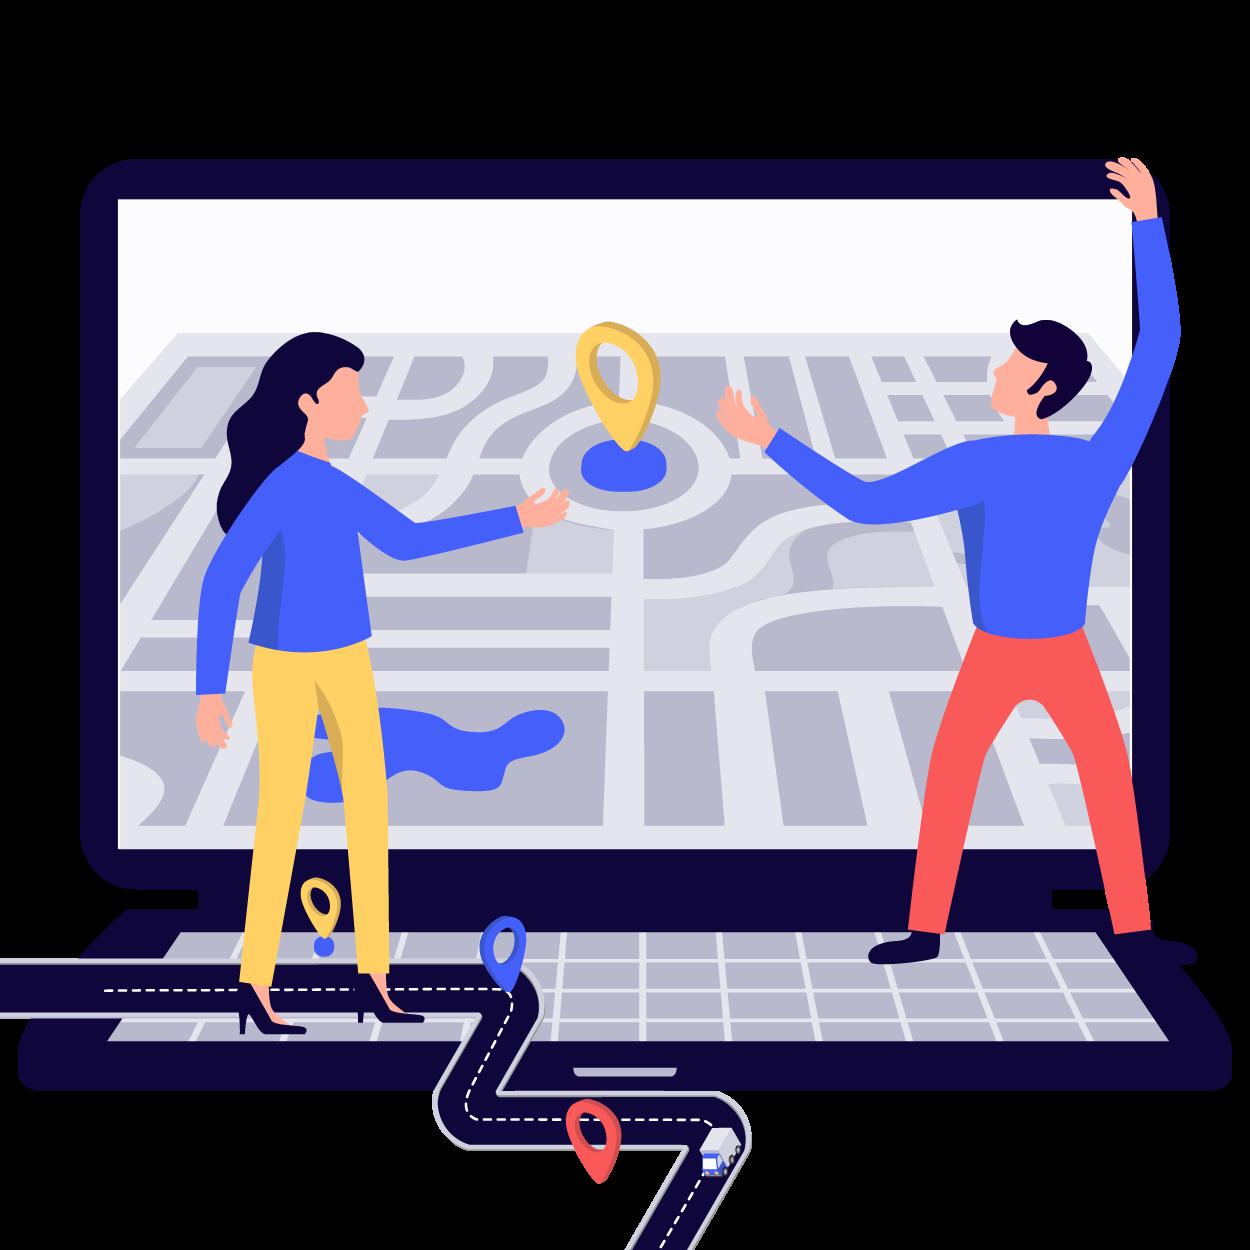 Outil concertation en ligne : la balade interactive